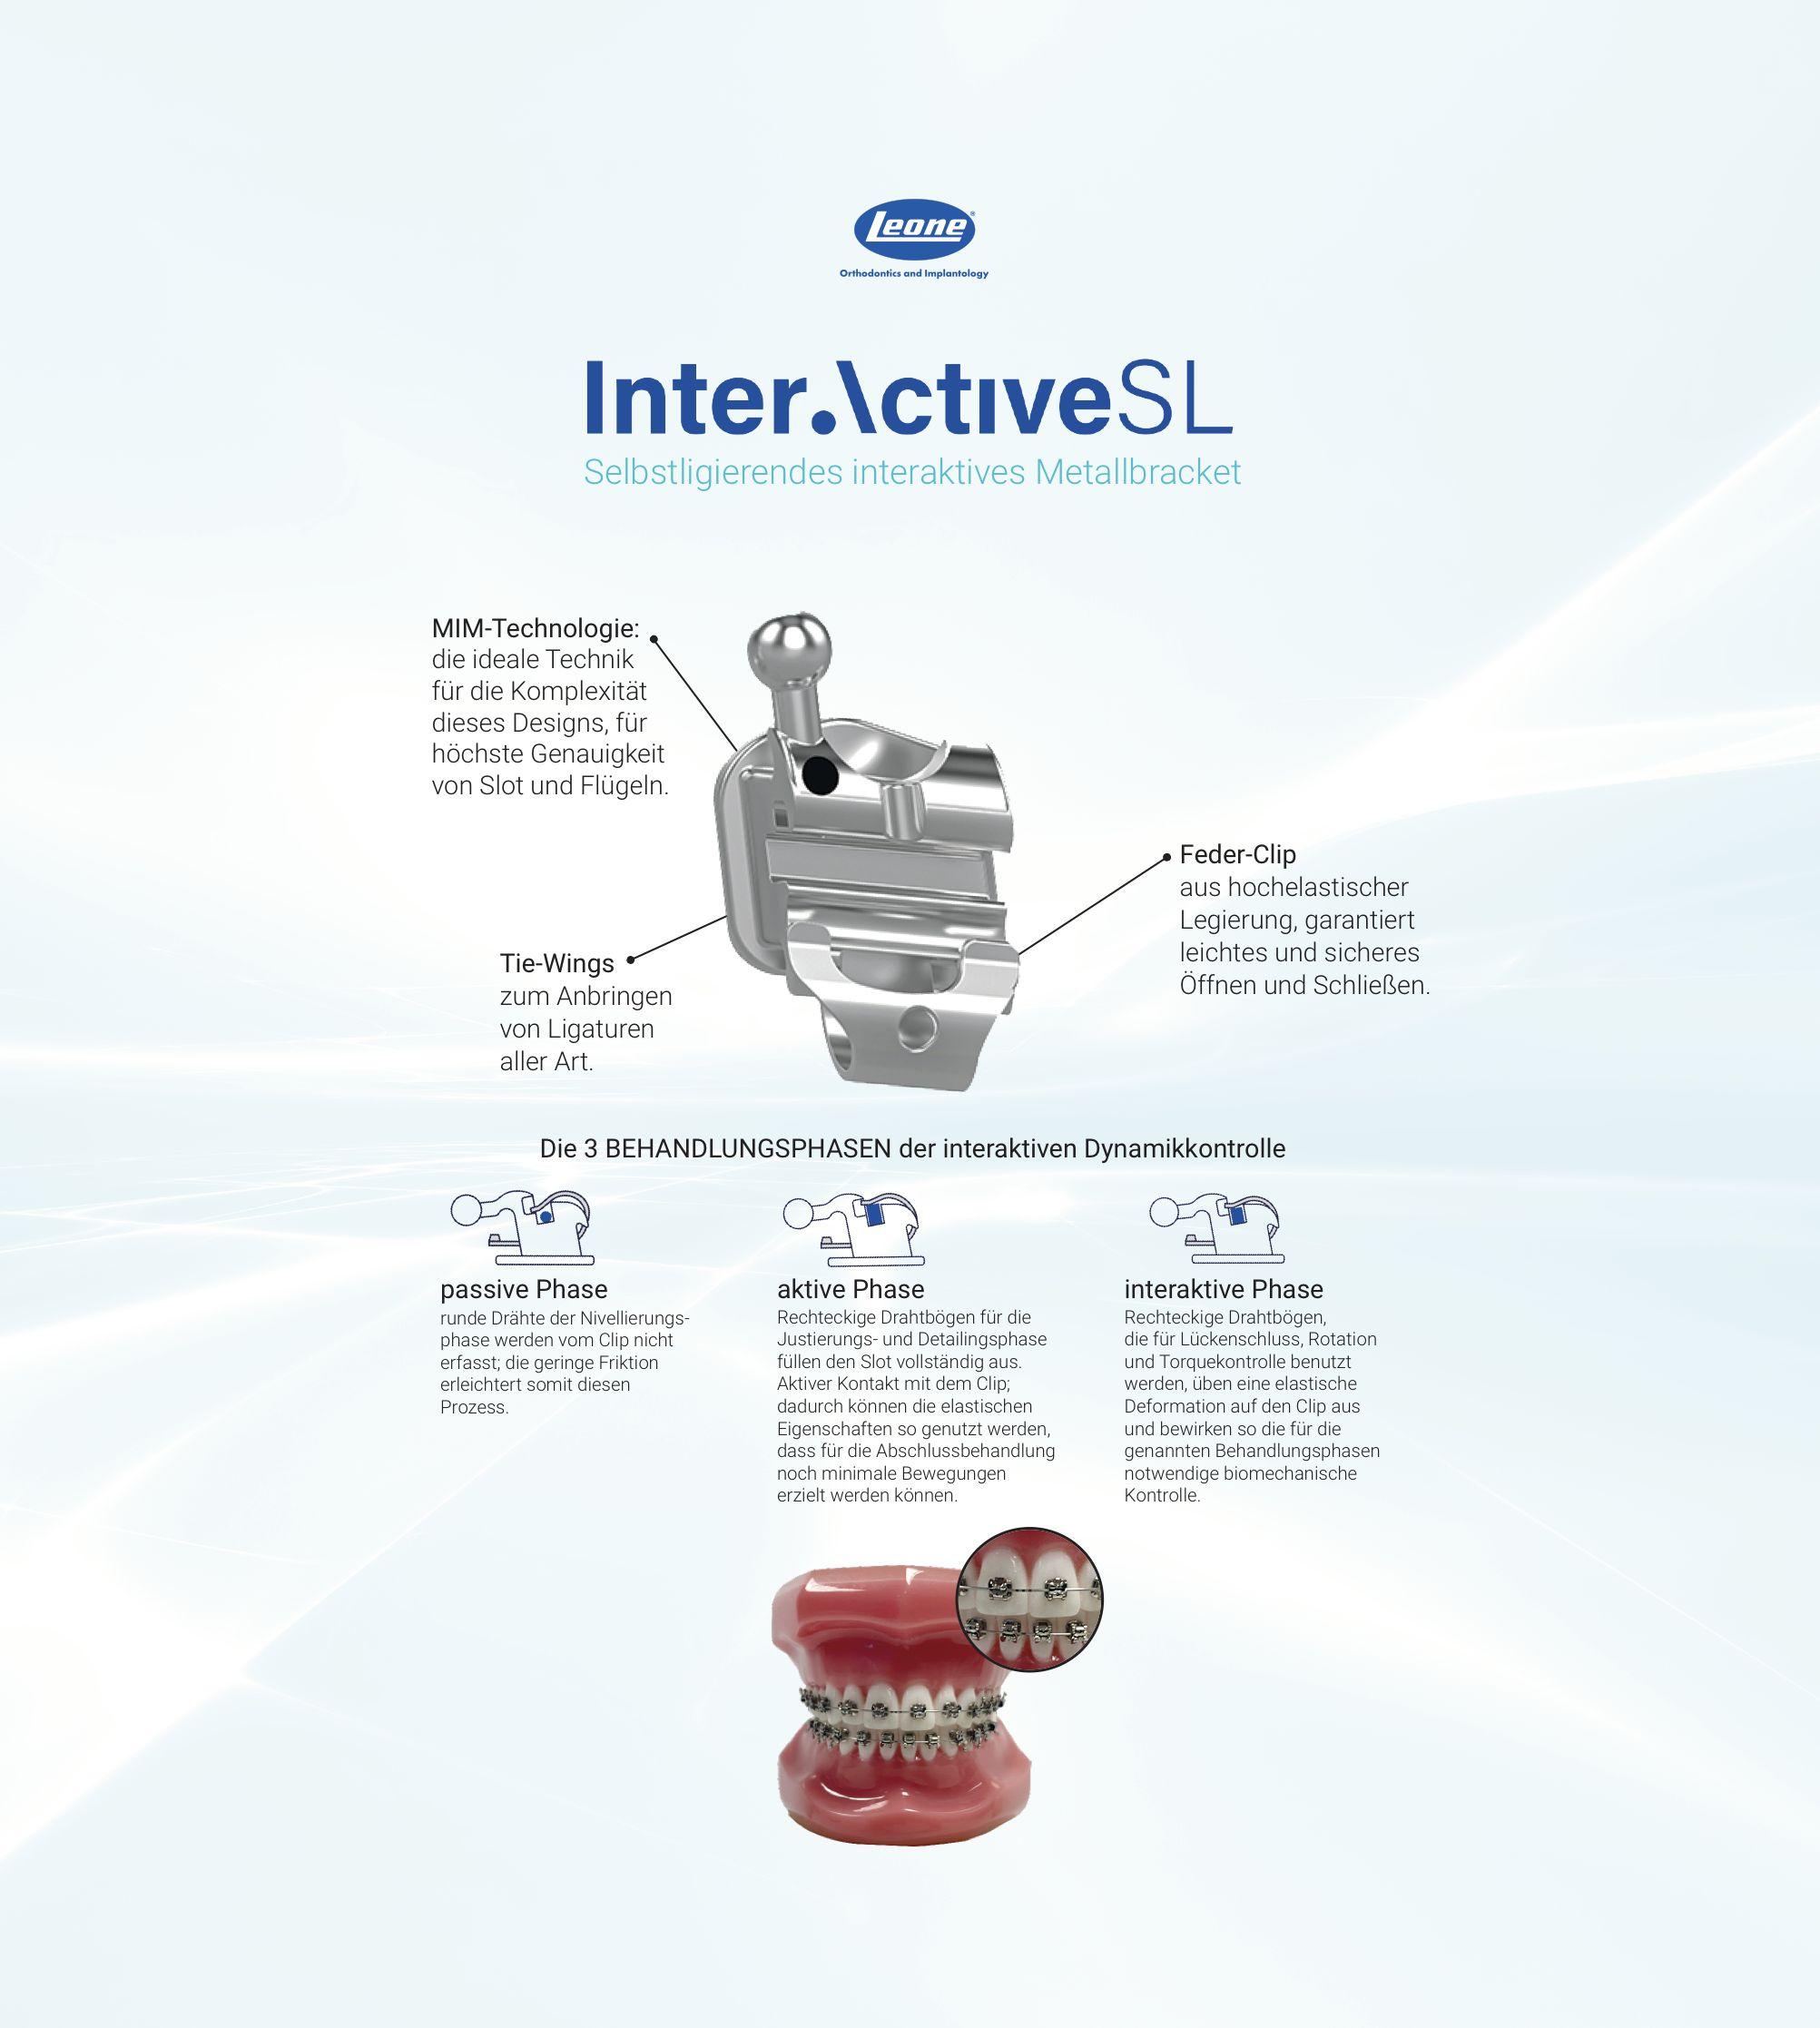 interaktive sl